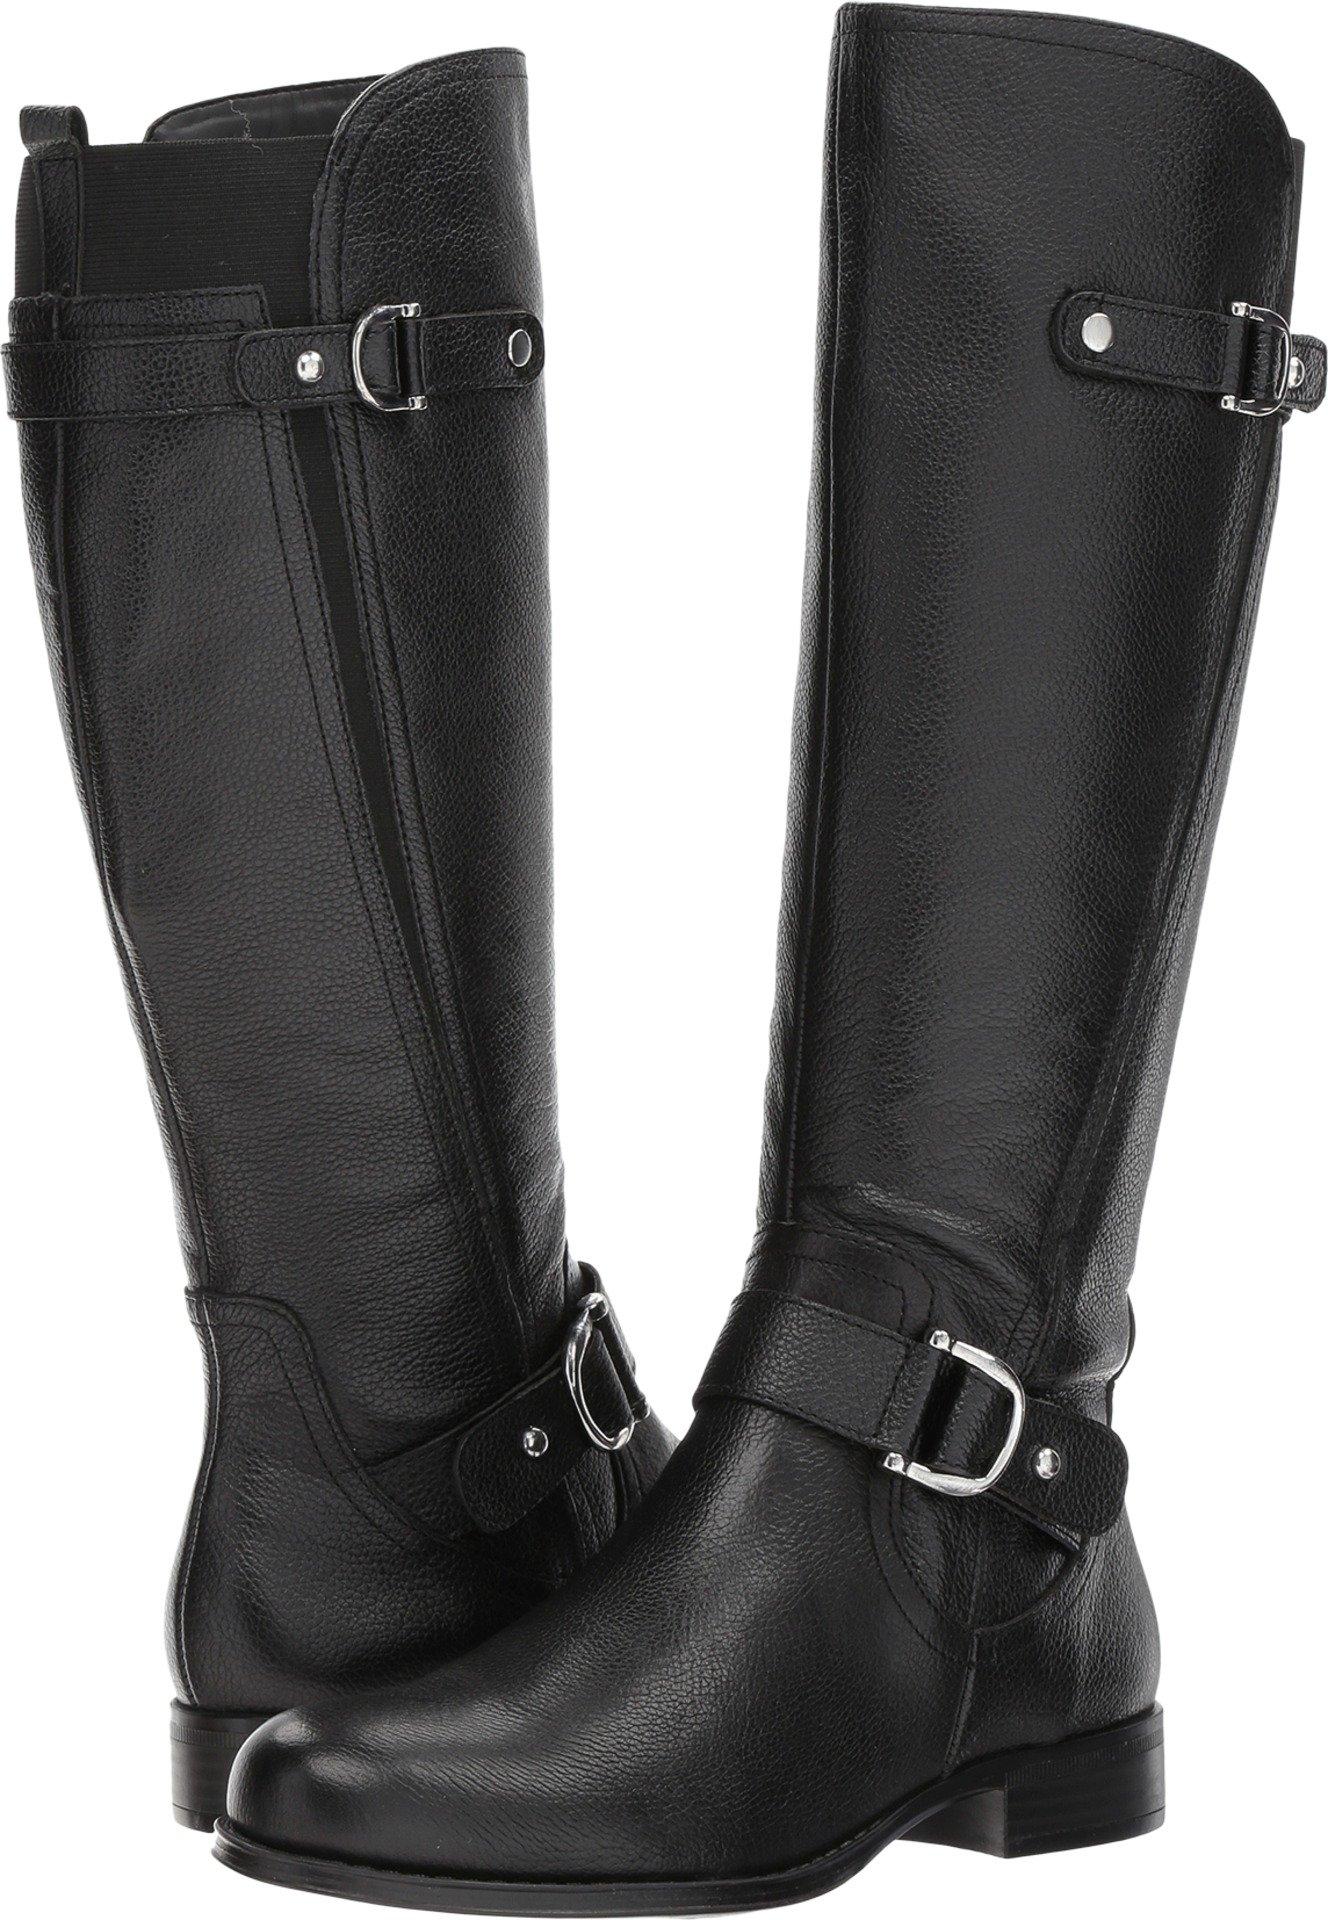 Naturalizer Women's Jenelle Riding Boot, Black, 8.5 W US